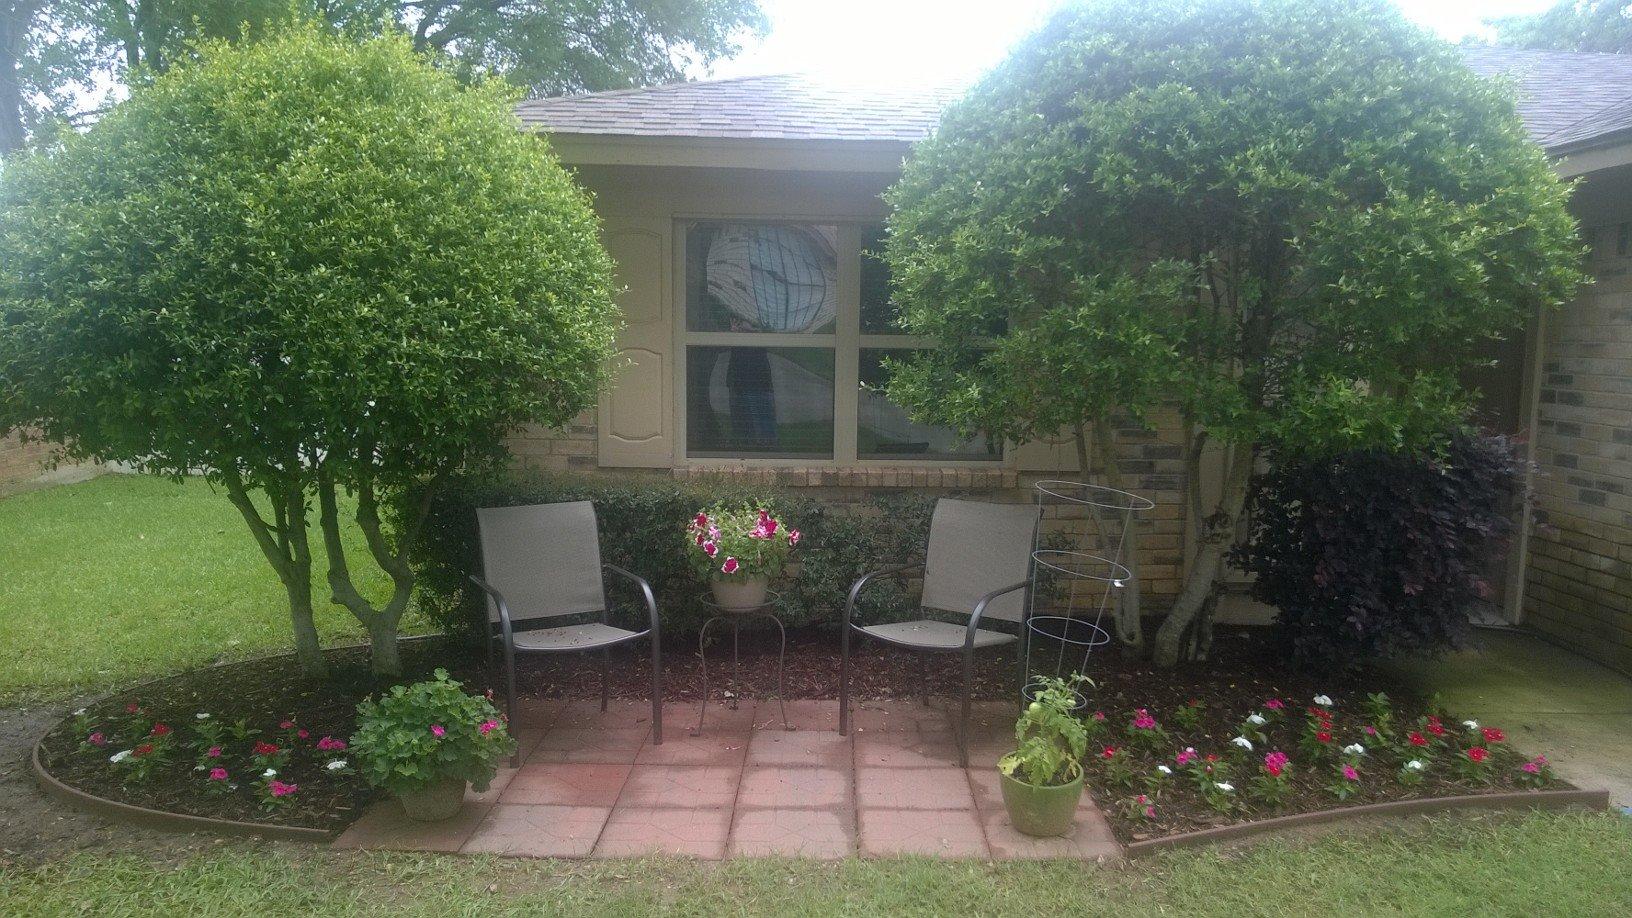 Milestone Church Springtime front yard project patio redo   Mercy House